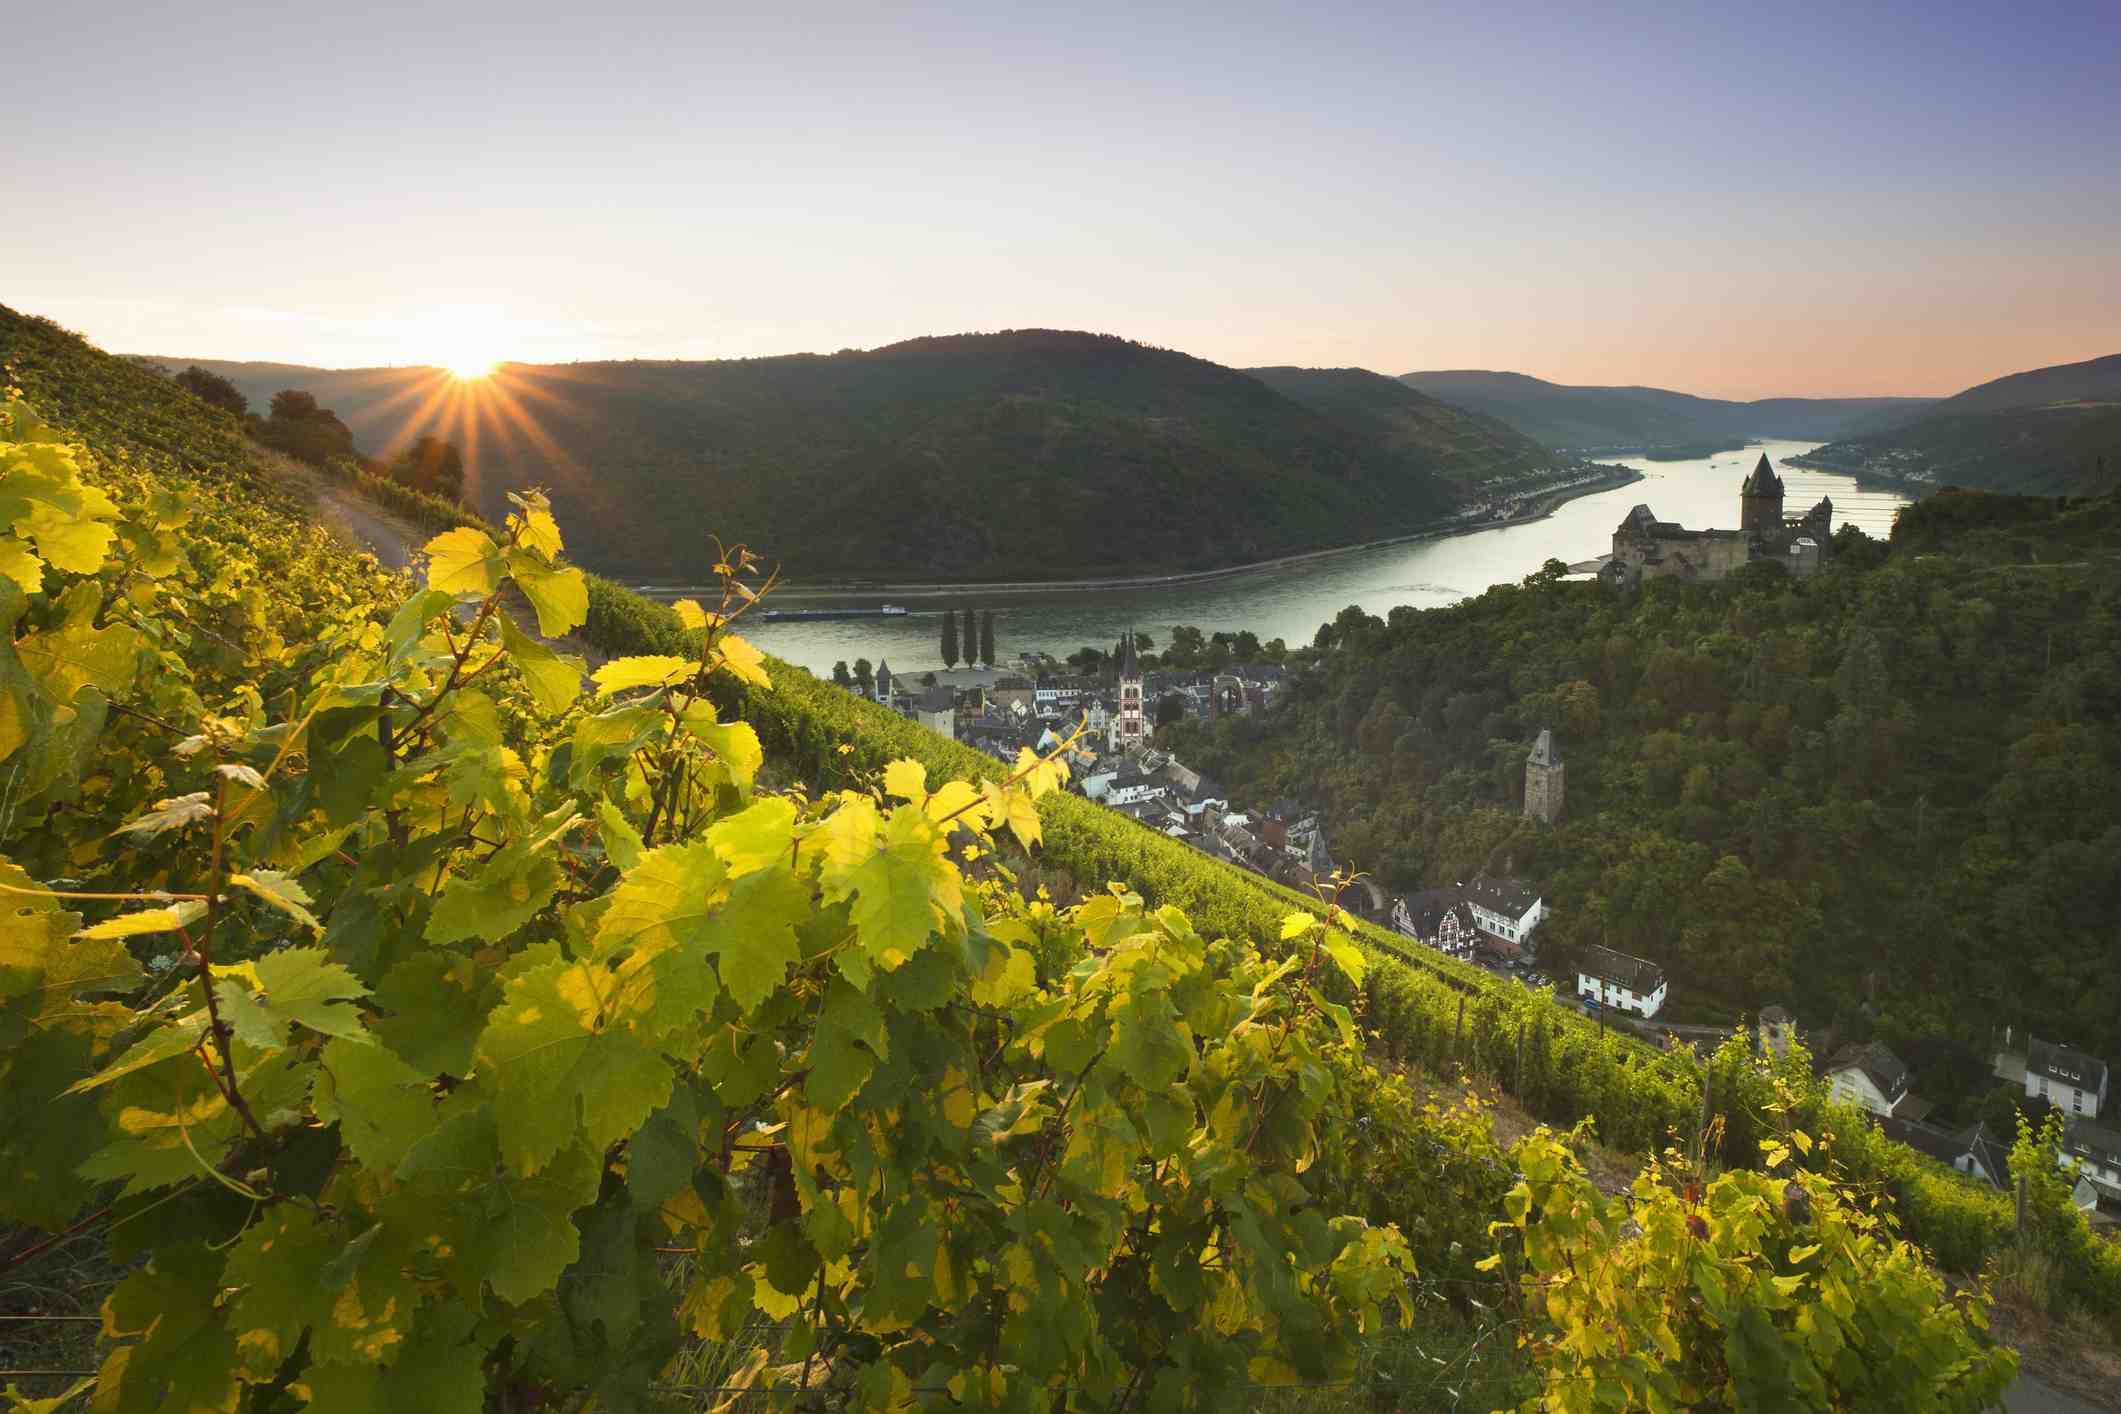 Bacharach vineyard